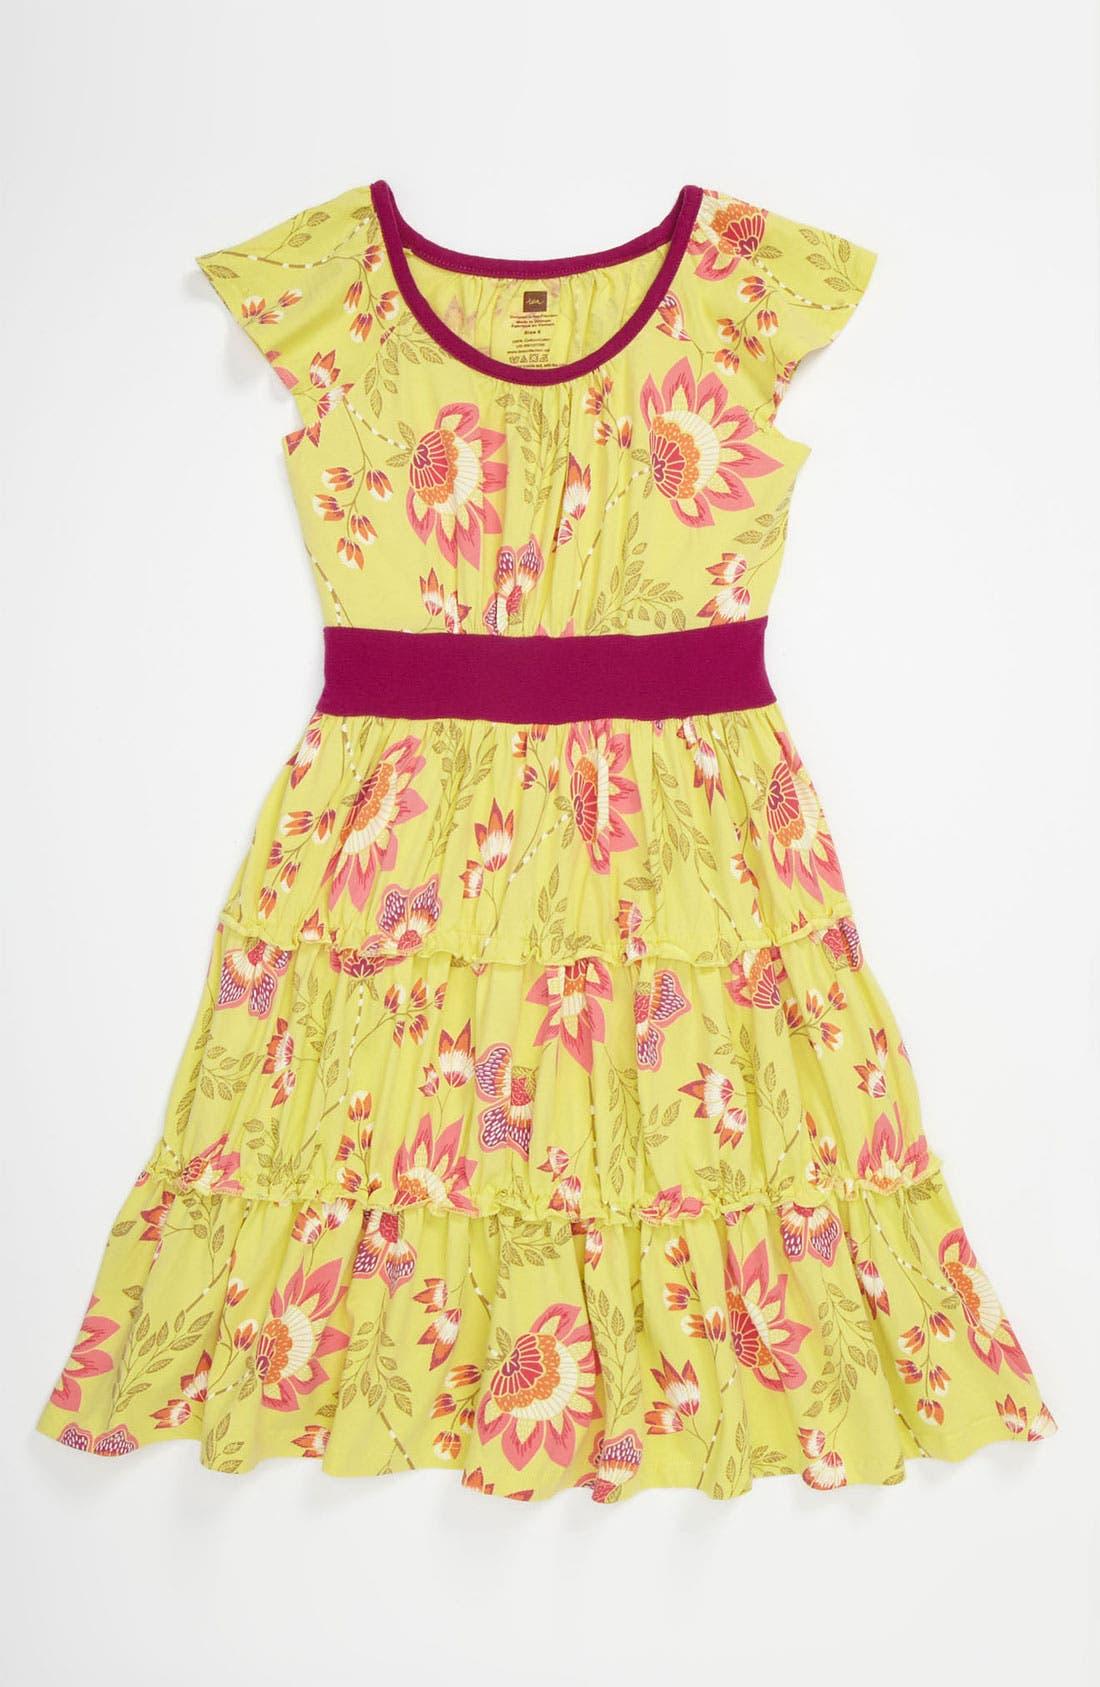 Main Image - Tea Collection 'Ardmore' Dress (Toddler)